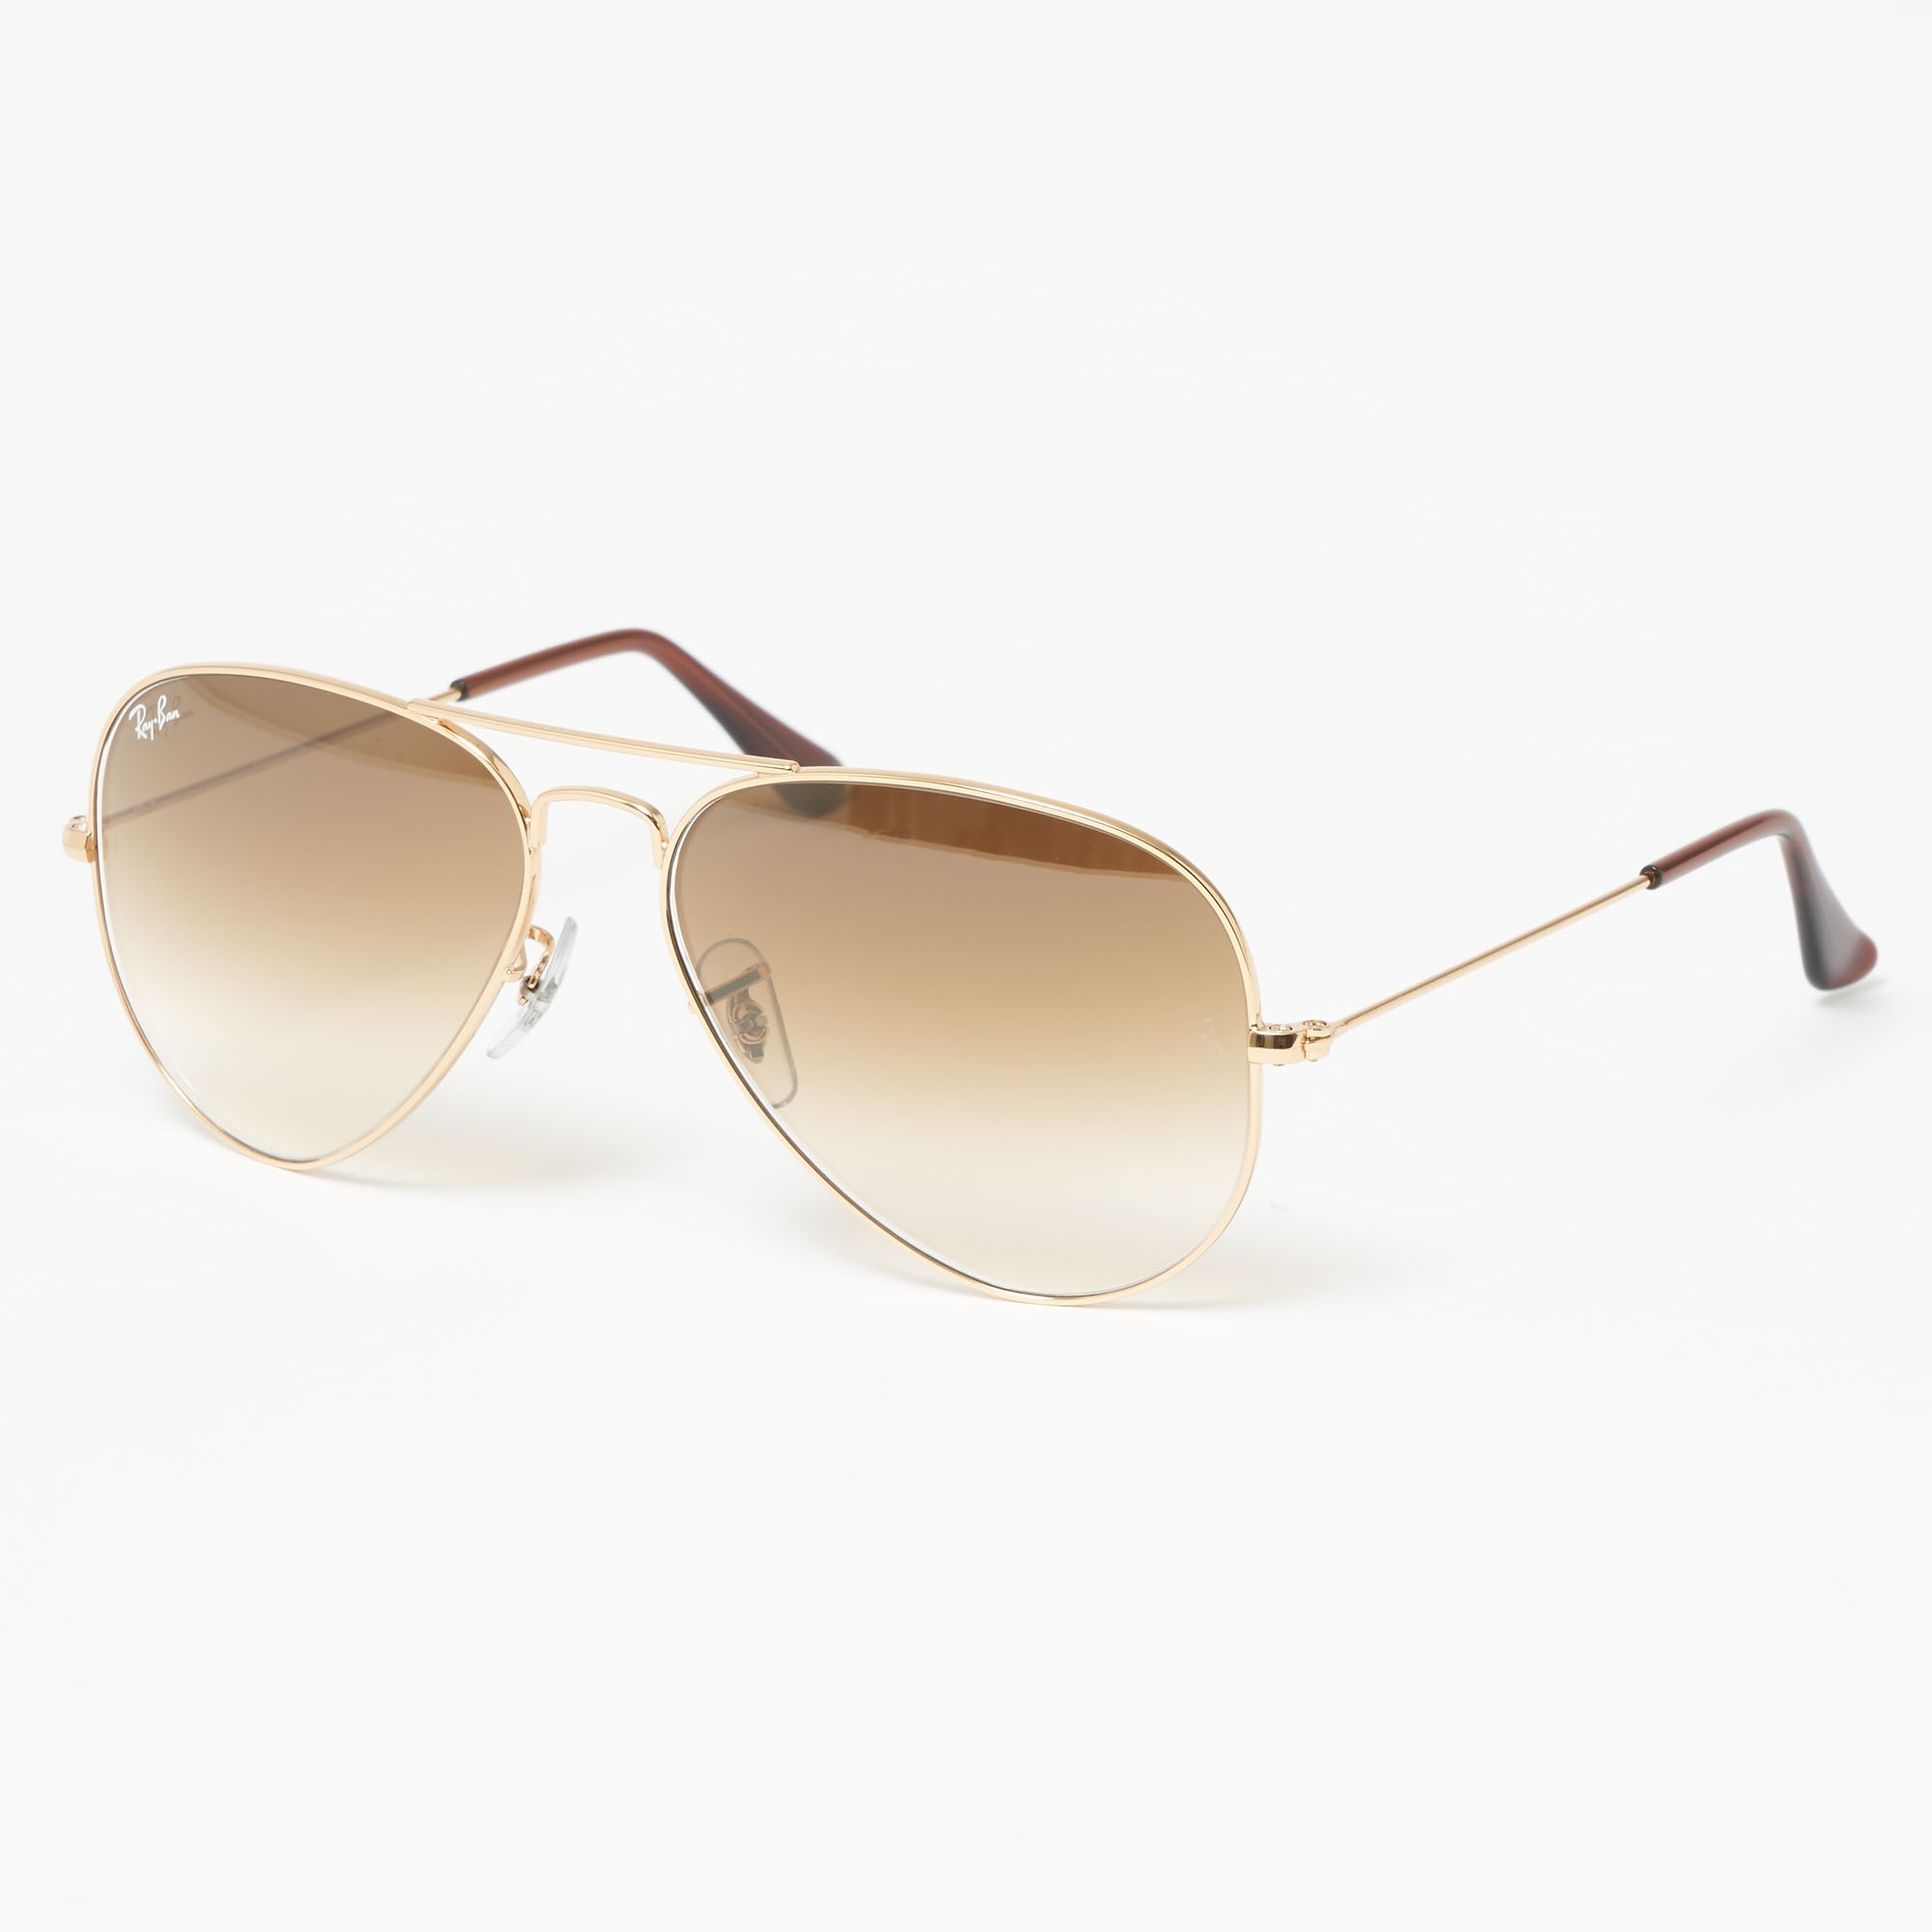 4aa0bafe28585 Gold Aviator Gradient Sunglasses - Light Brown Gradient Lenses